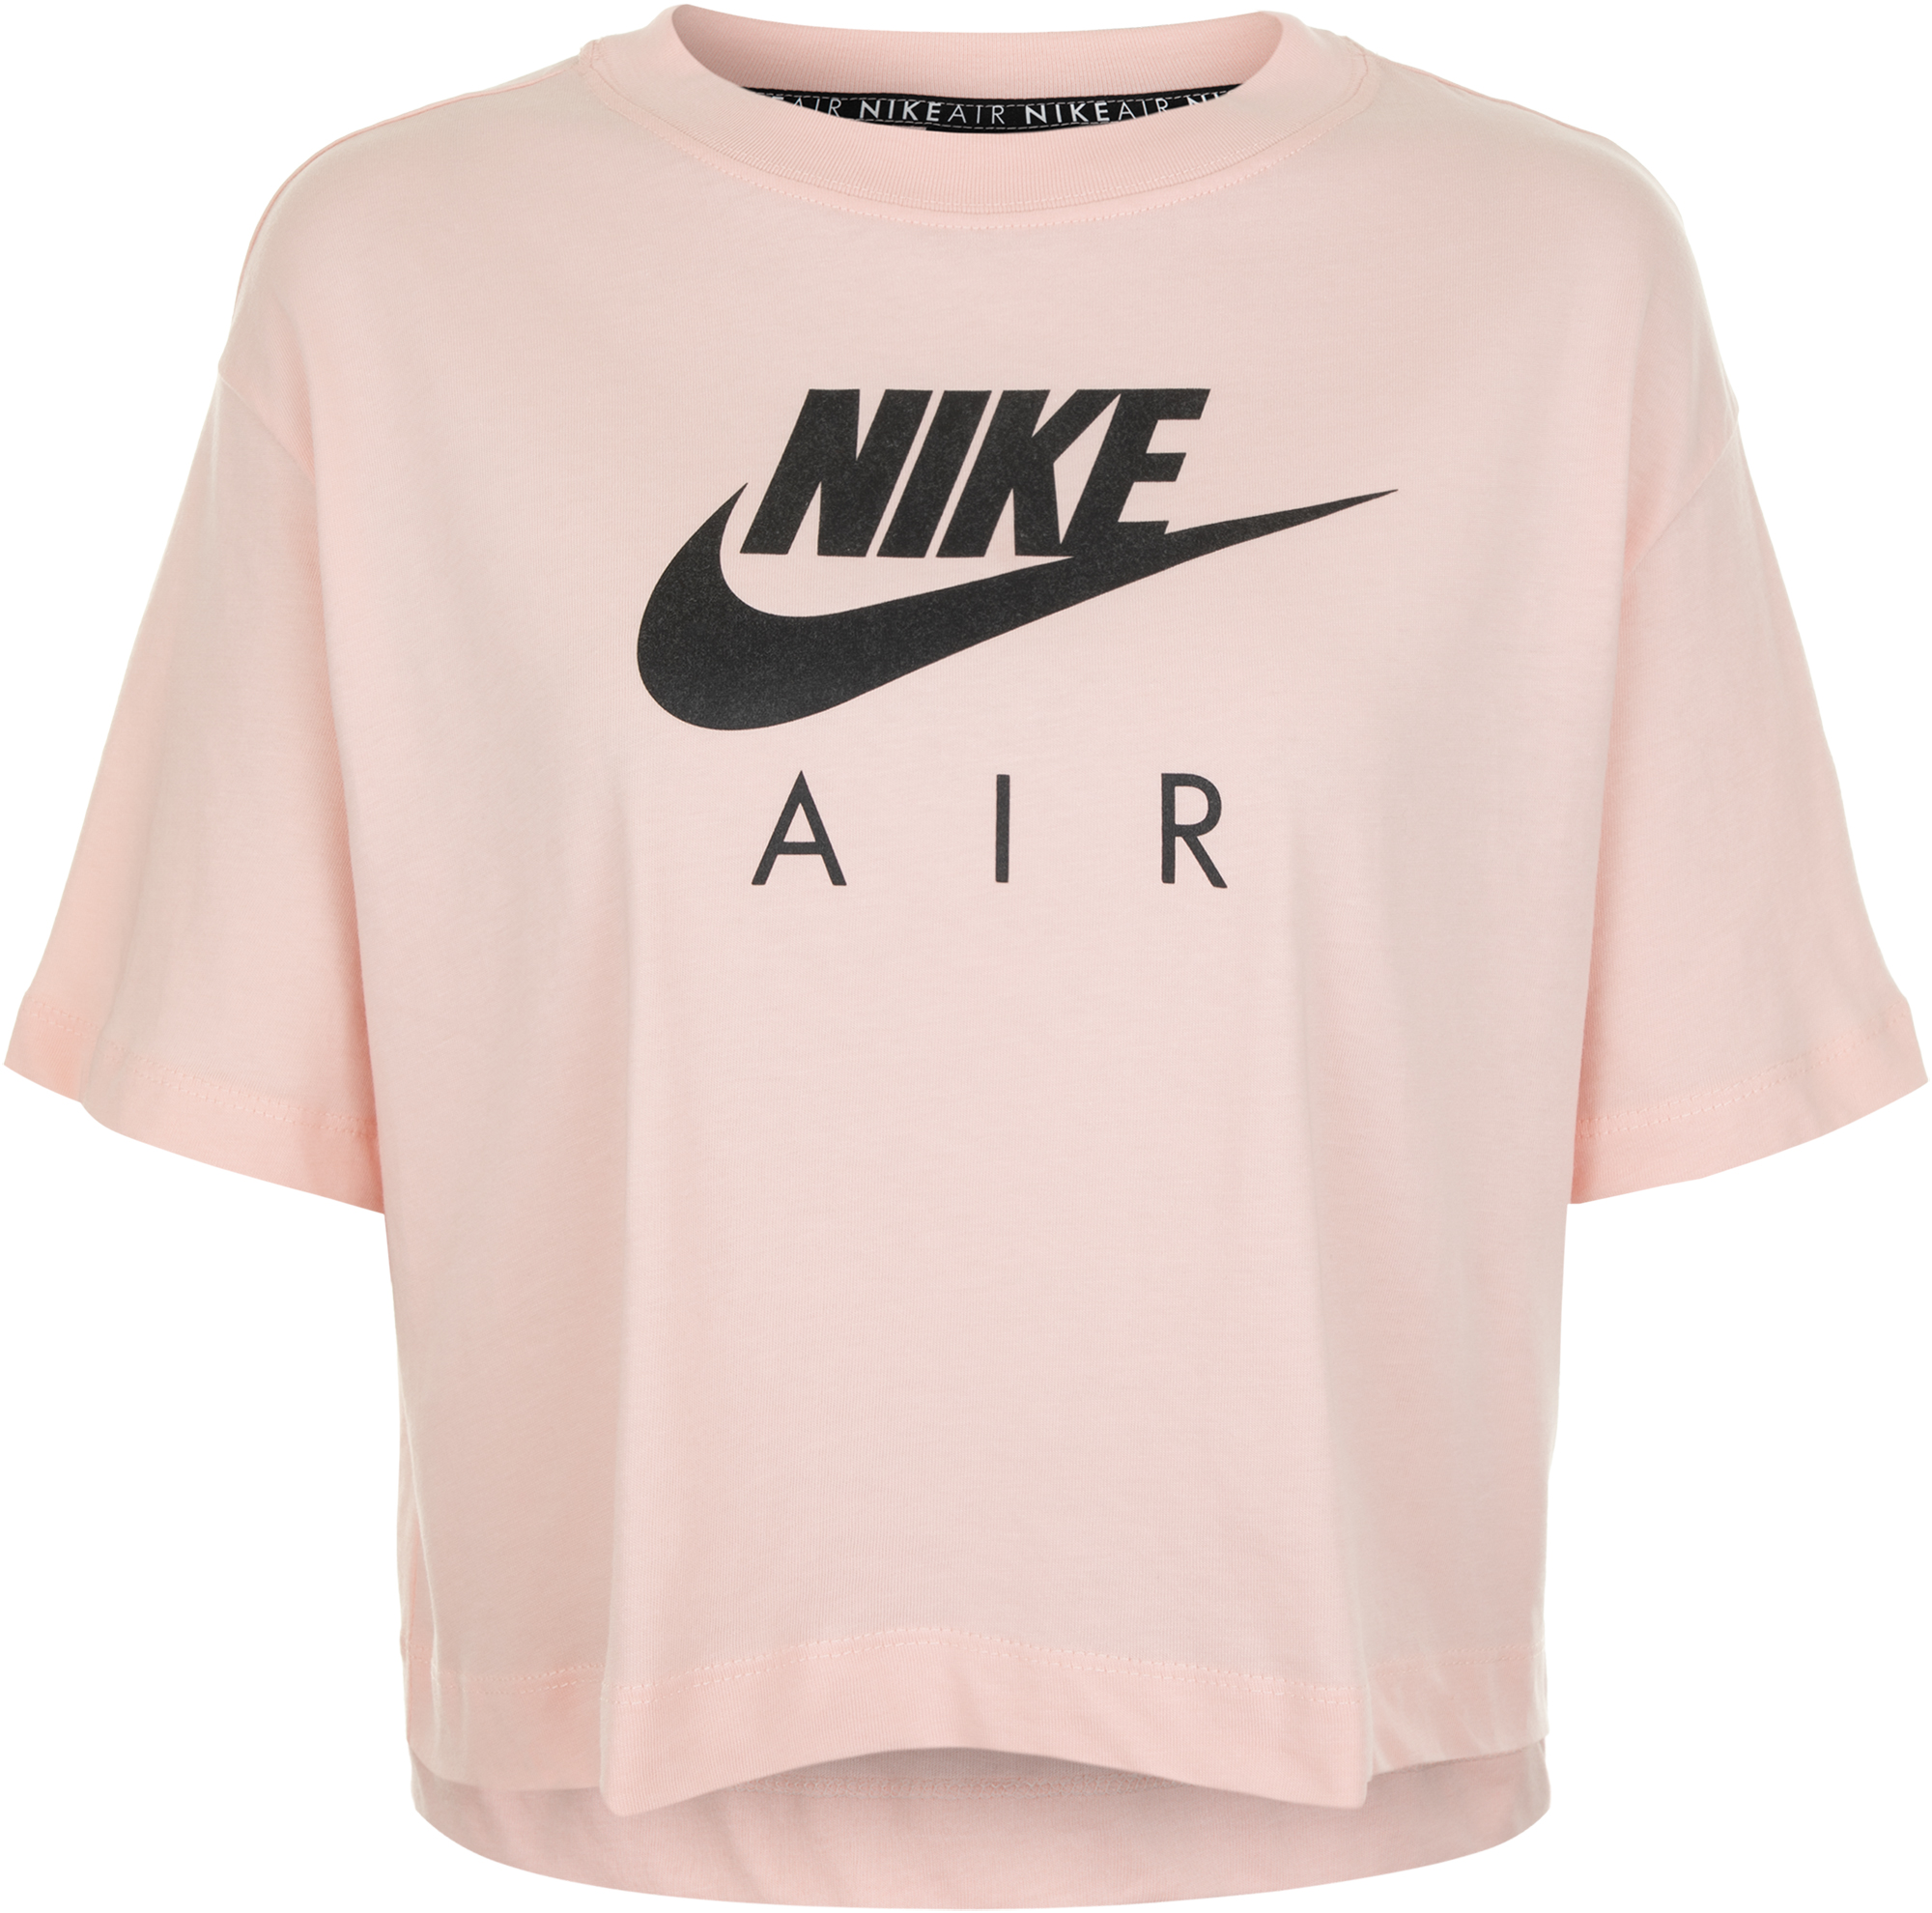 Nike Футболка женская Nike Air, размер 48-50 nike майка женская nike размер 48 50